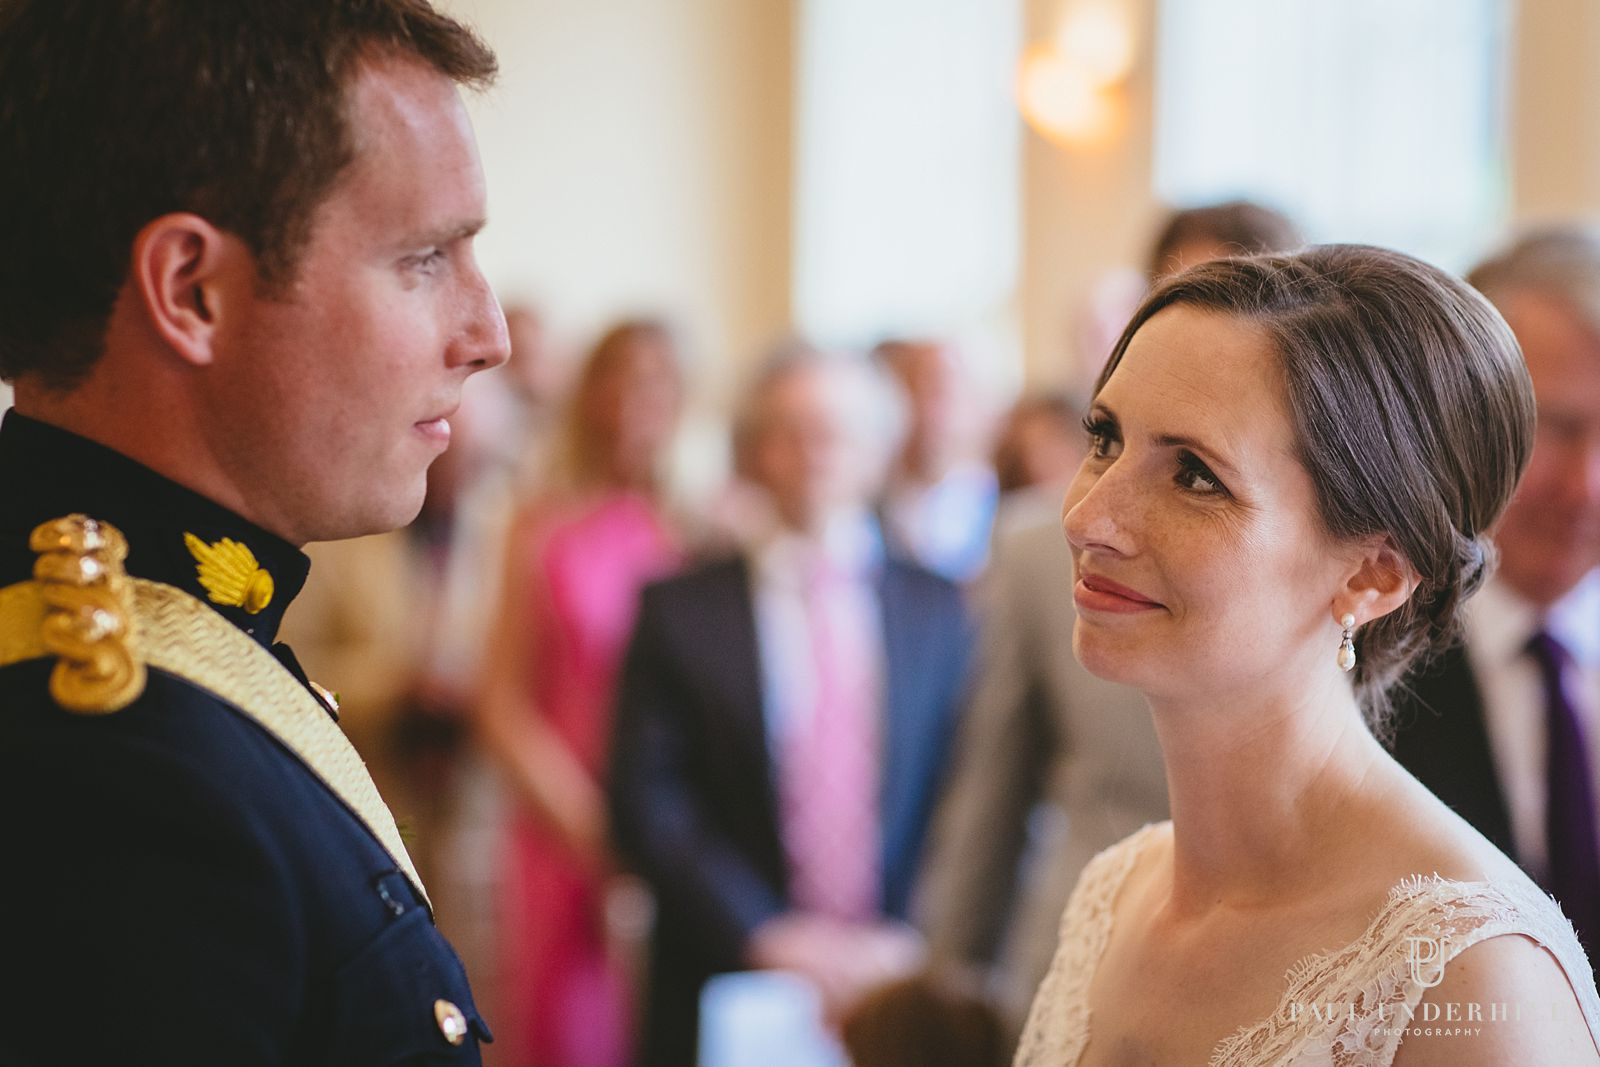 Wedding at Orangery suite Sherborne castle